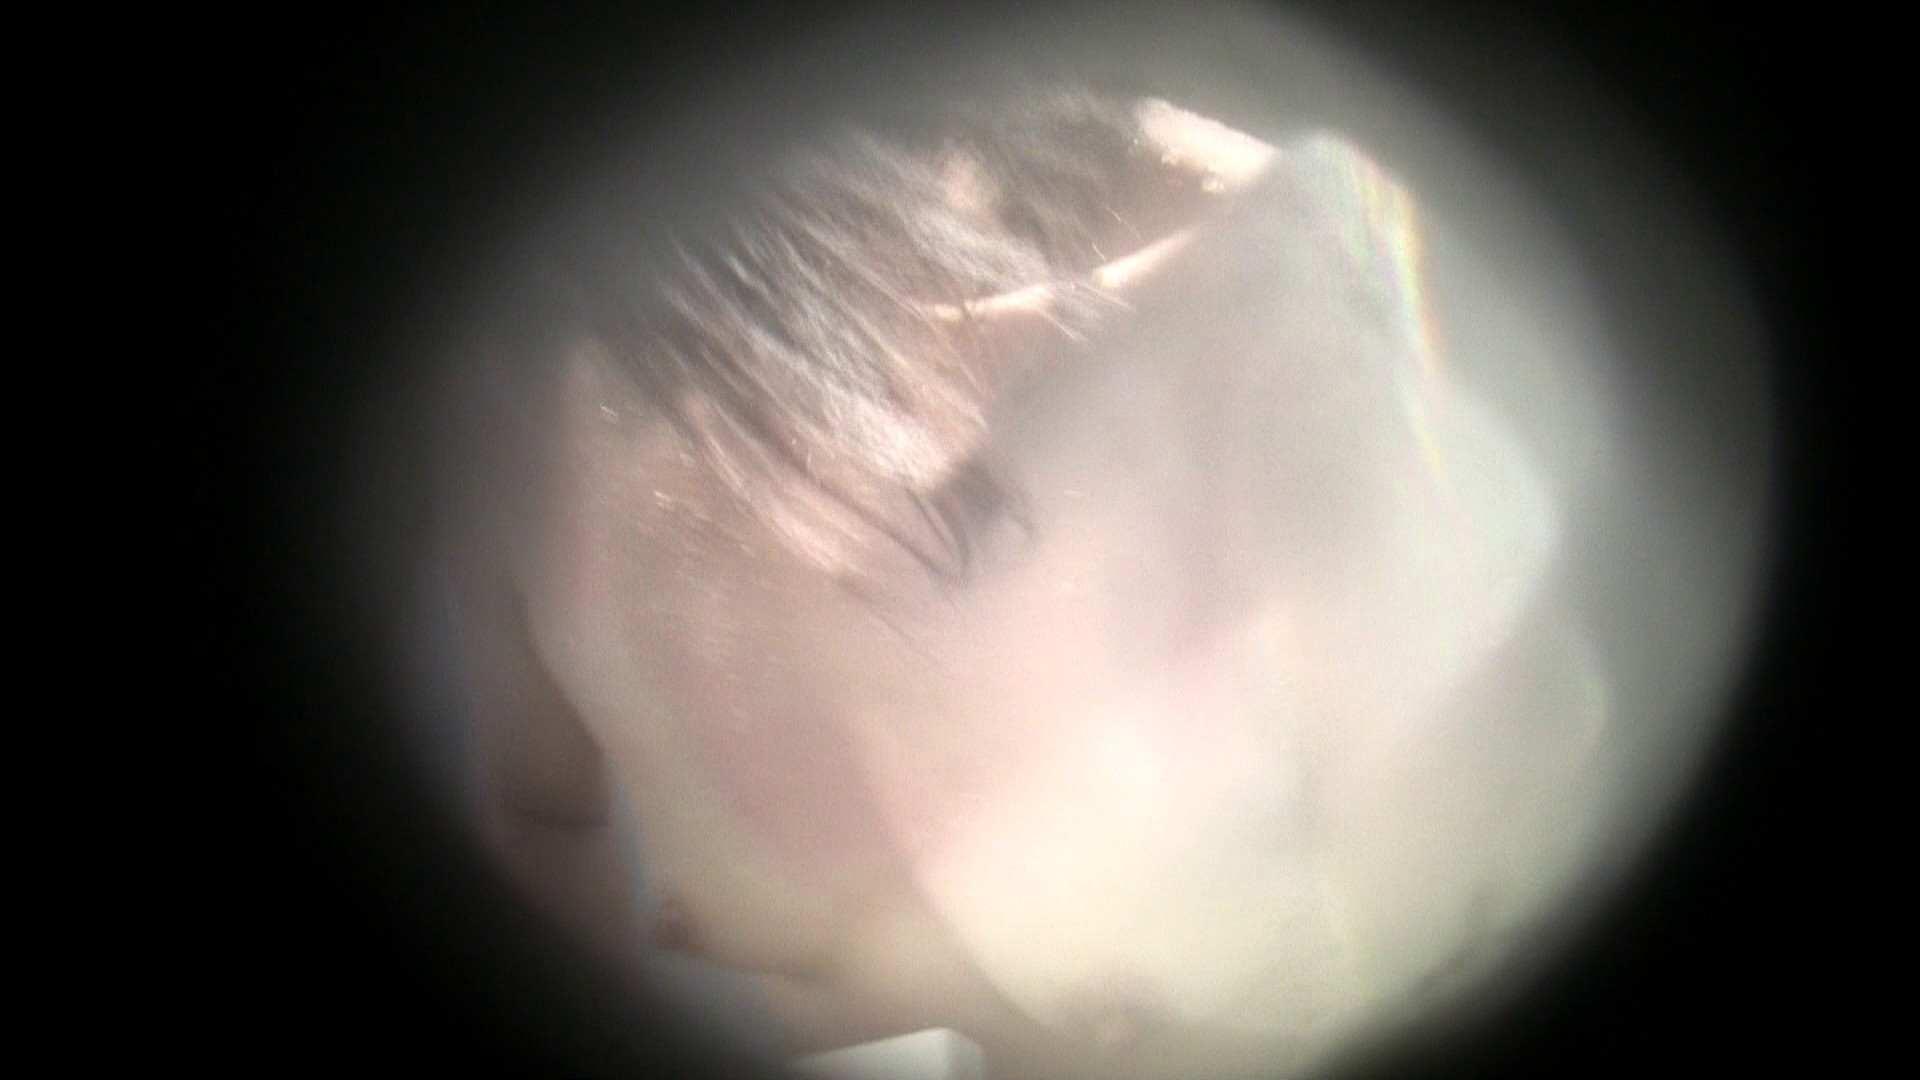 NO.11 年増の一本道!!中身ハミ出てます 覗き | シャワー室  94pic 52